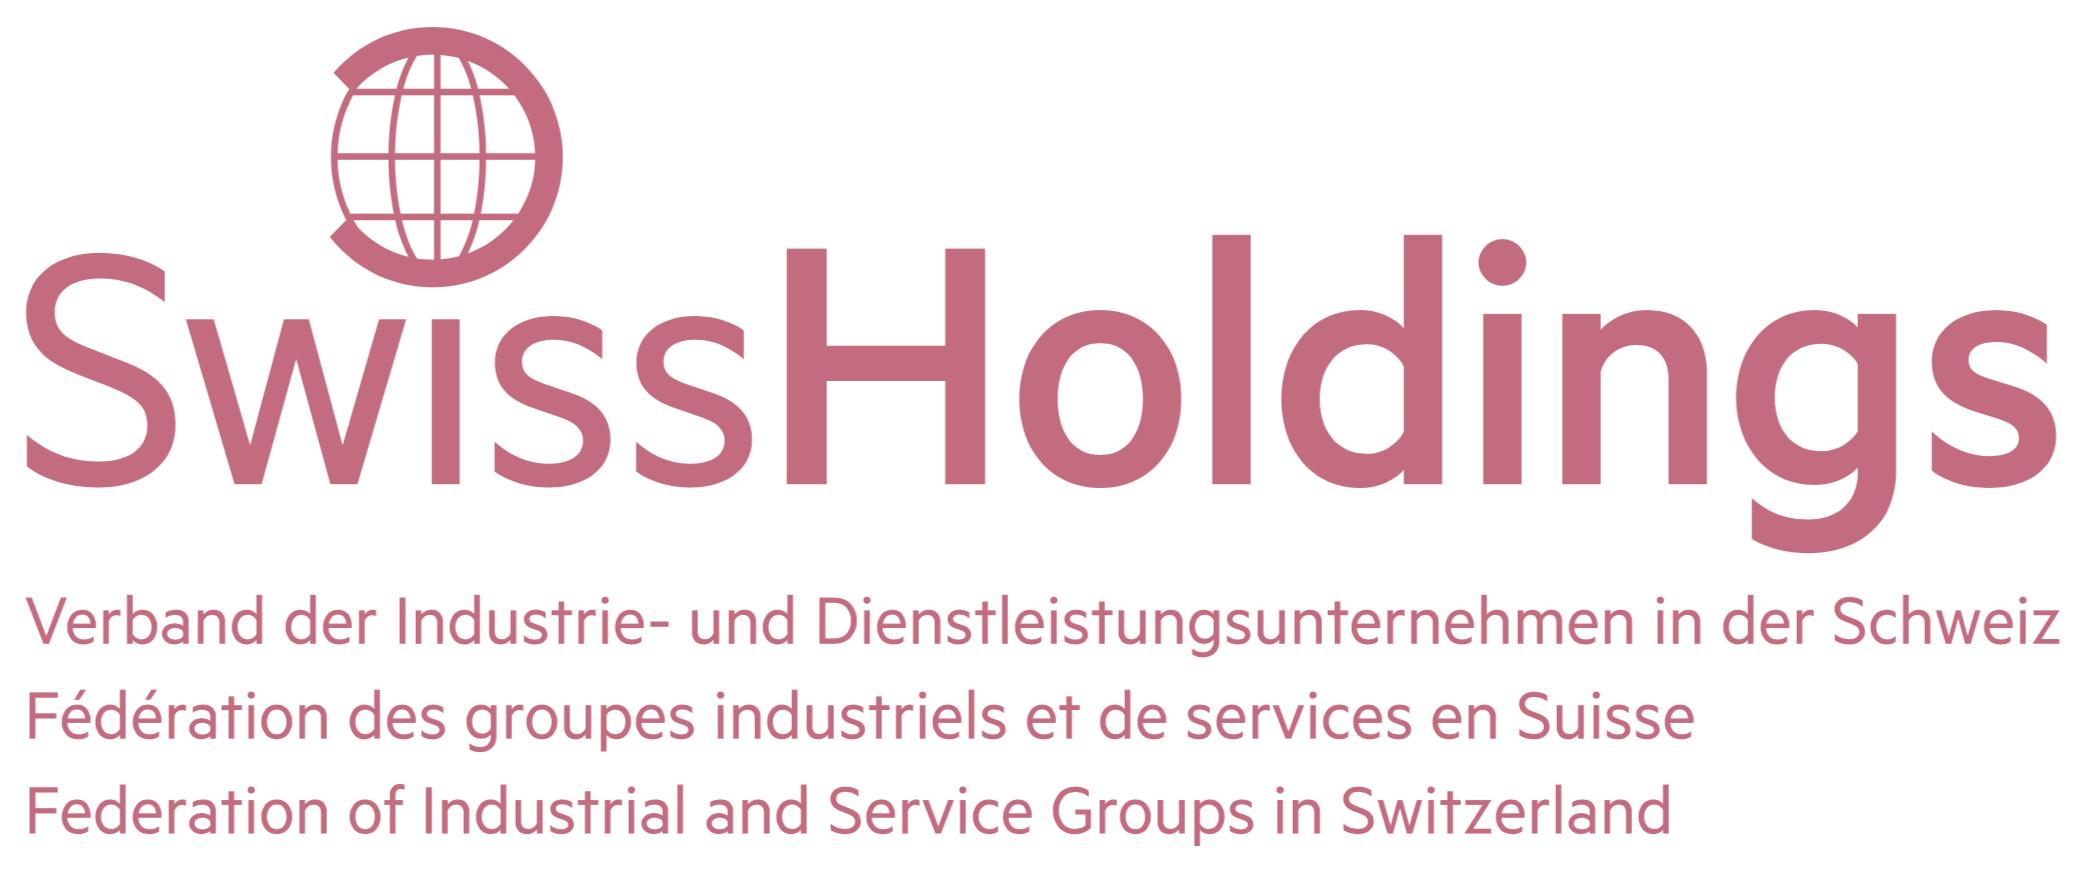 SwissHoldings